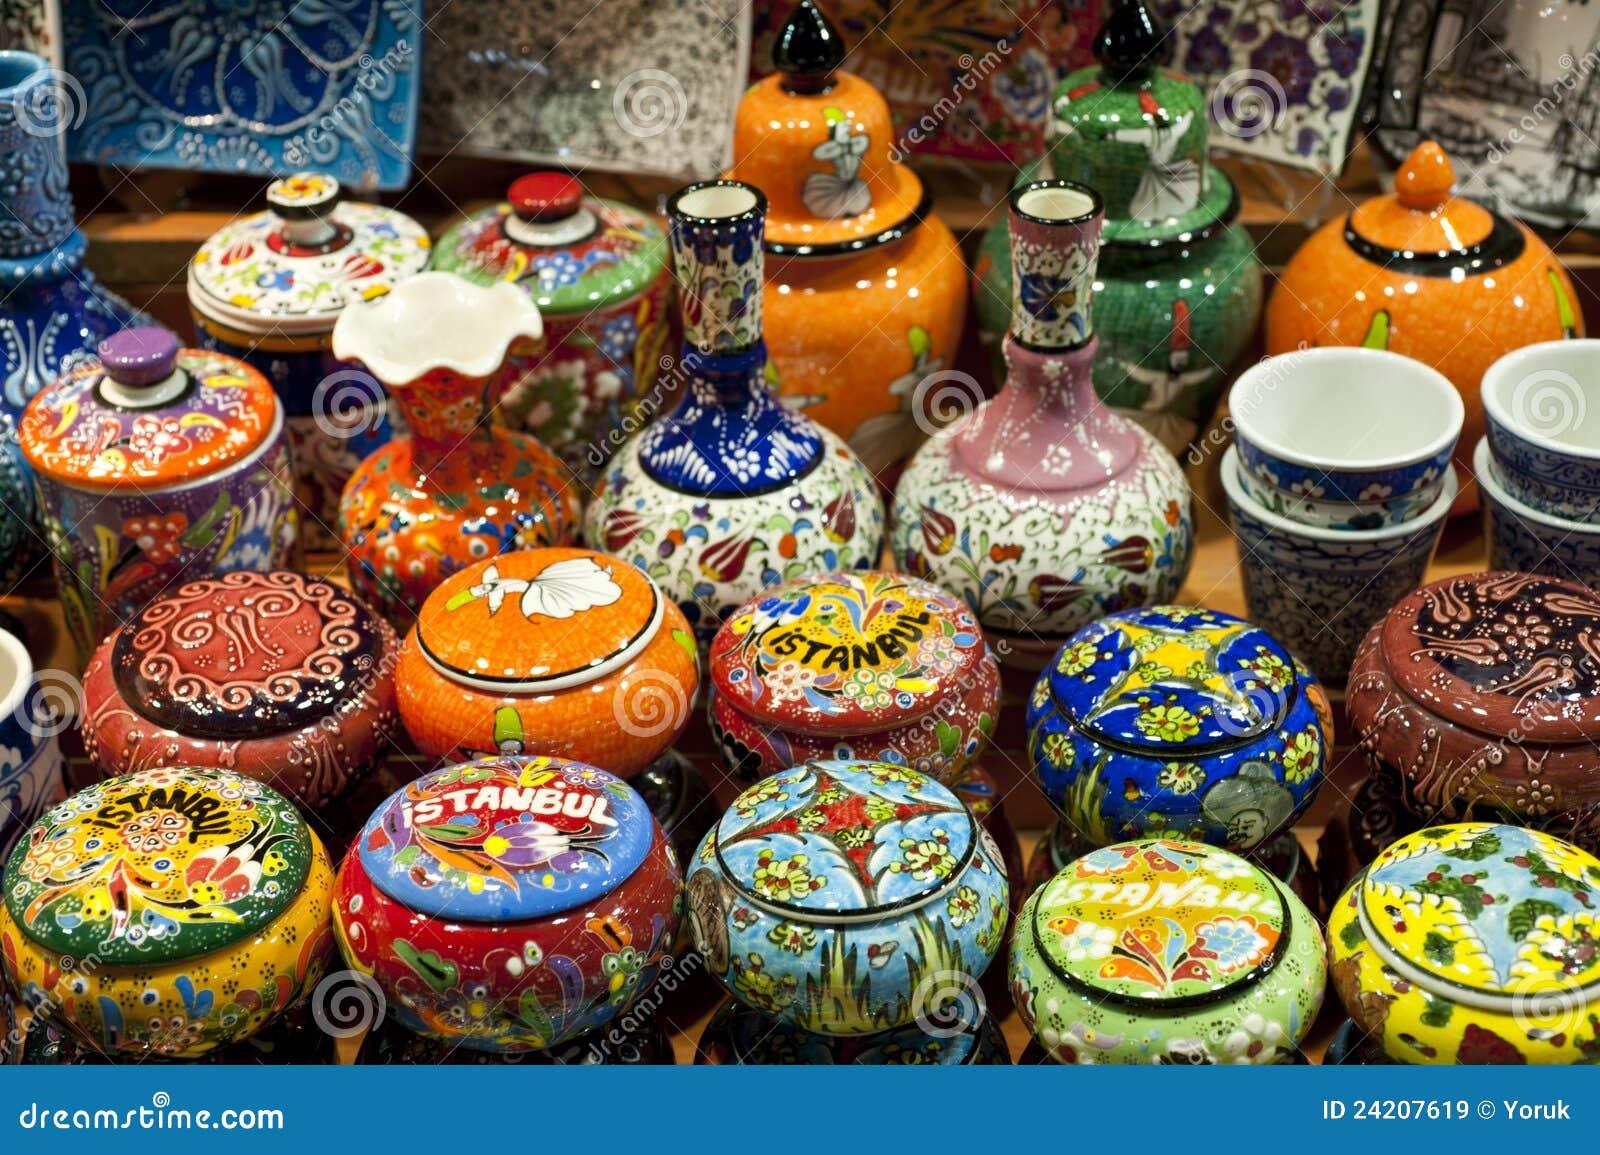 Ceramics On Display Istanbul Turkey Royalty Free Stock